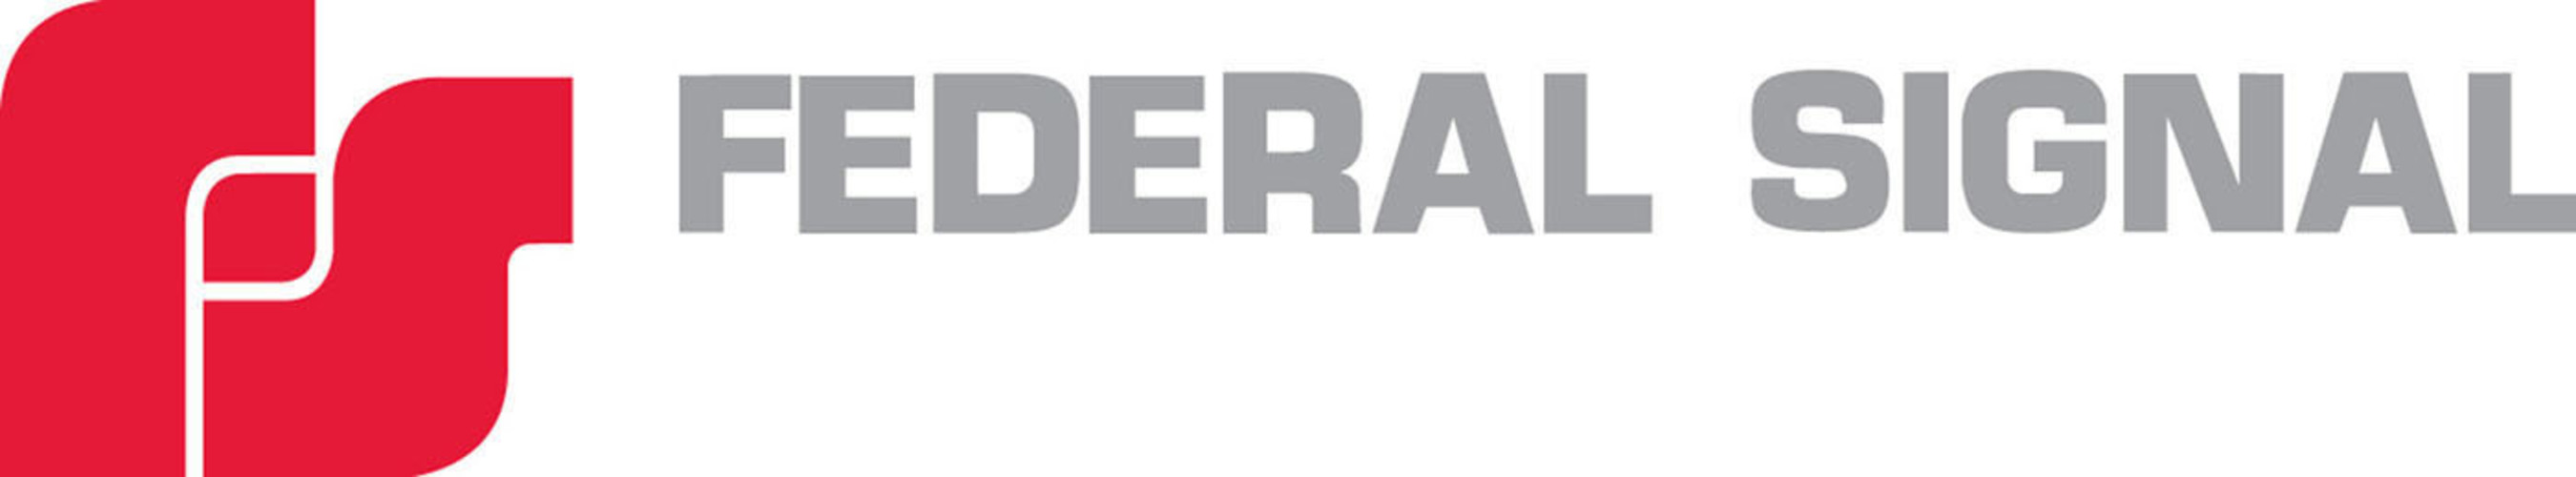 Federal Signal Corporation Logo.